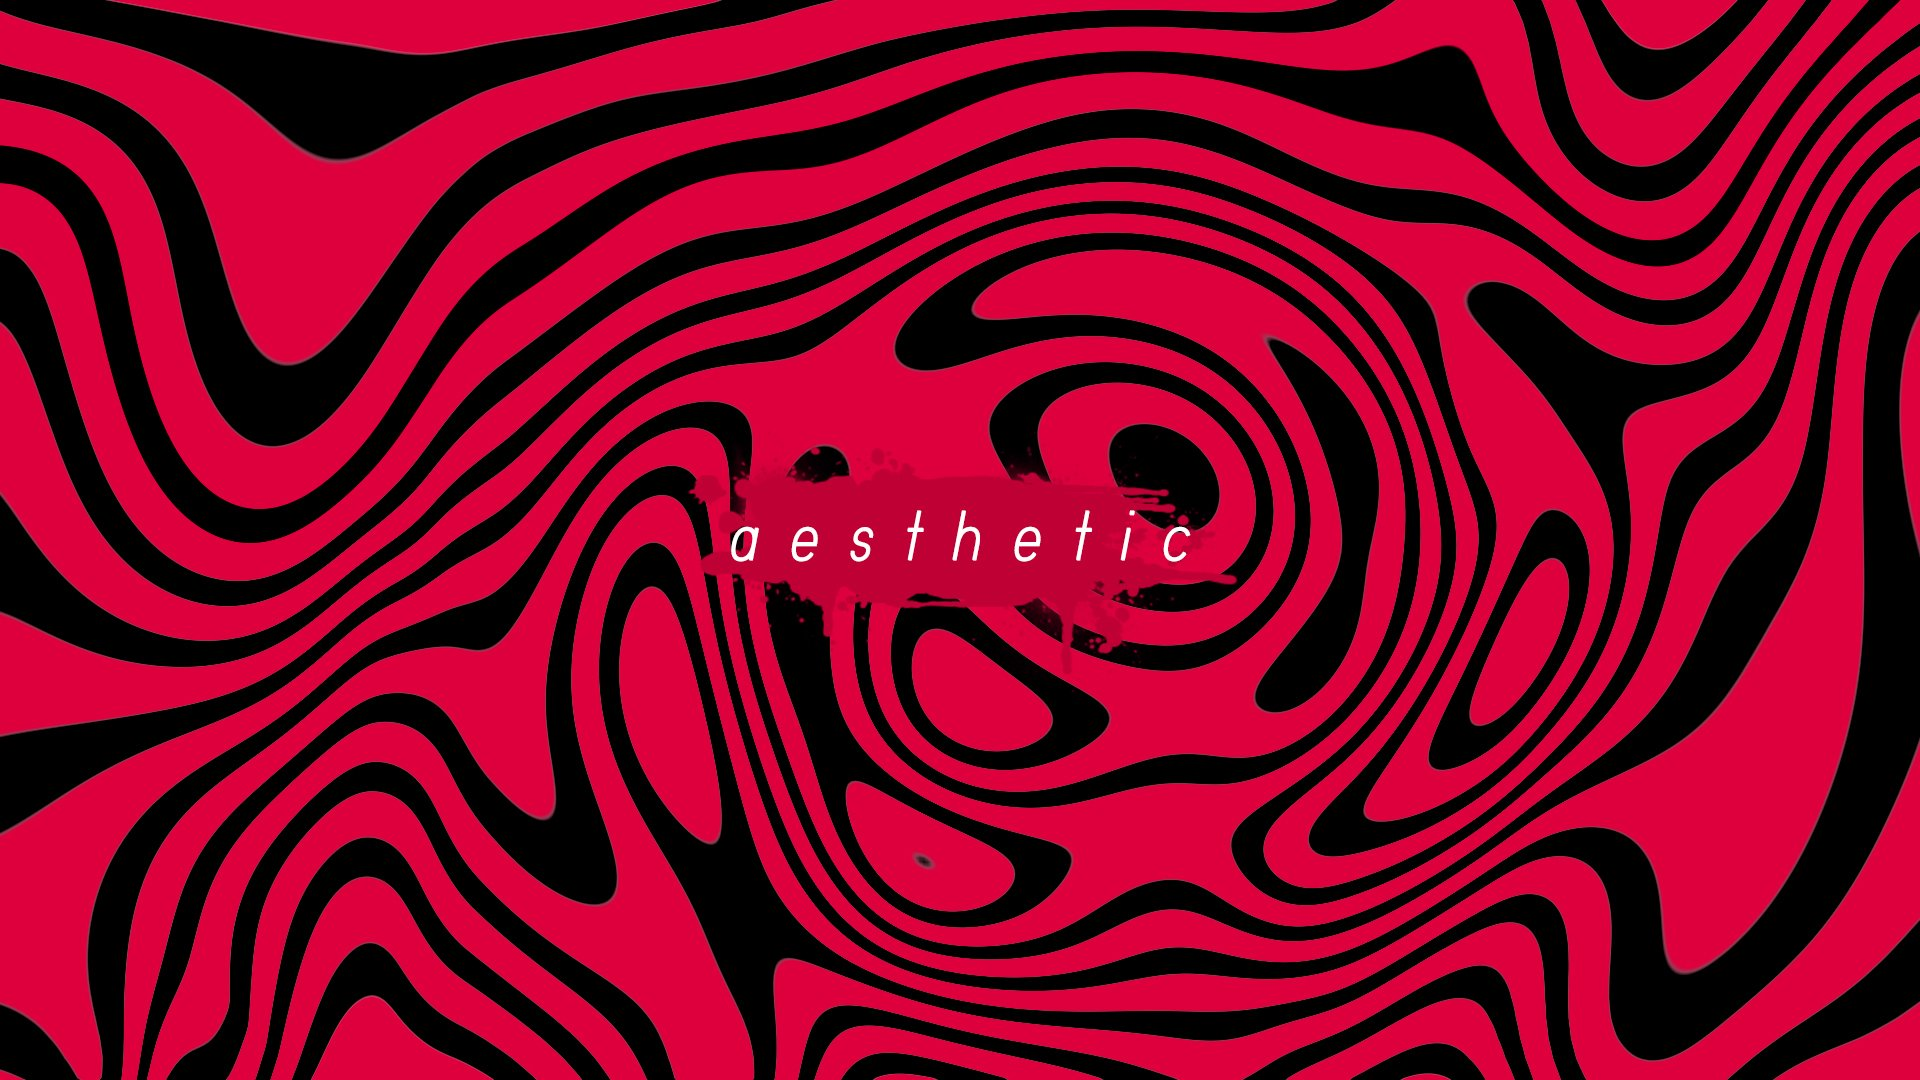 Swirl Hd Wallpaper Background Image 1920x1080 Id